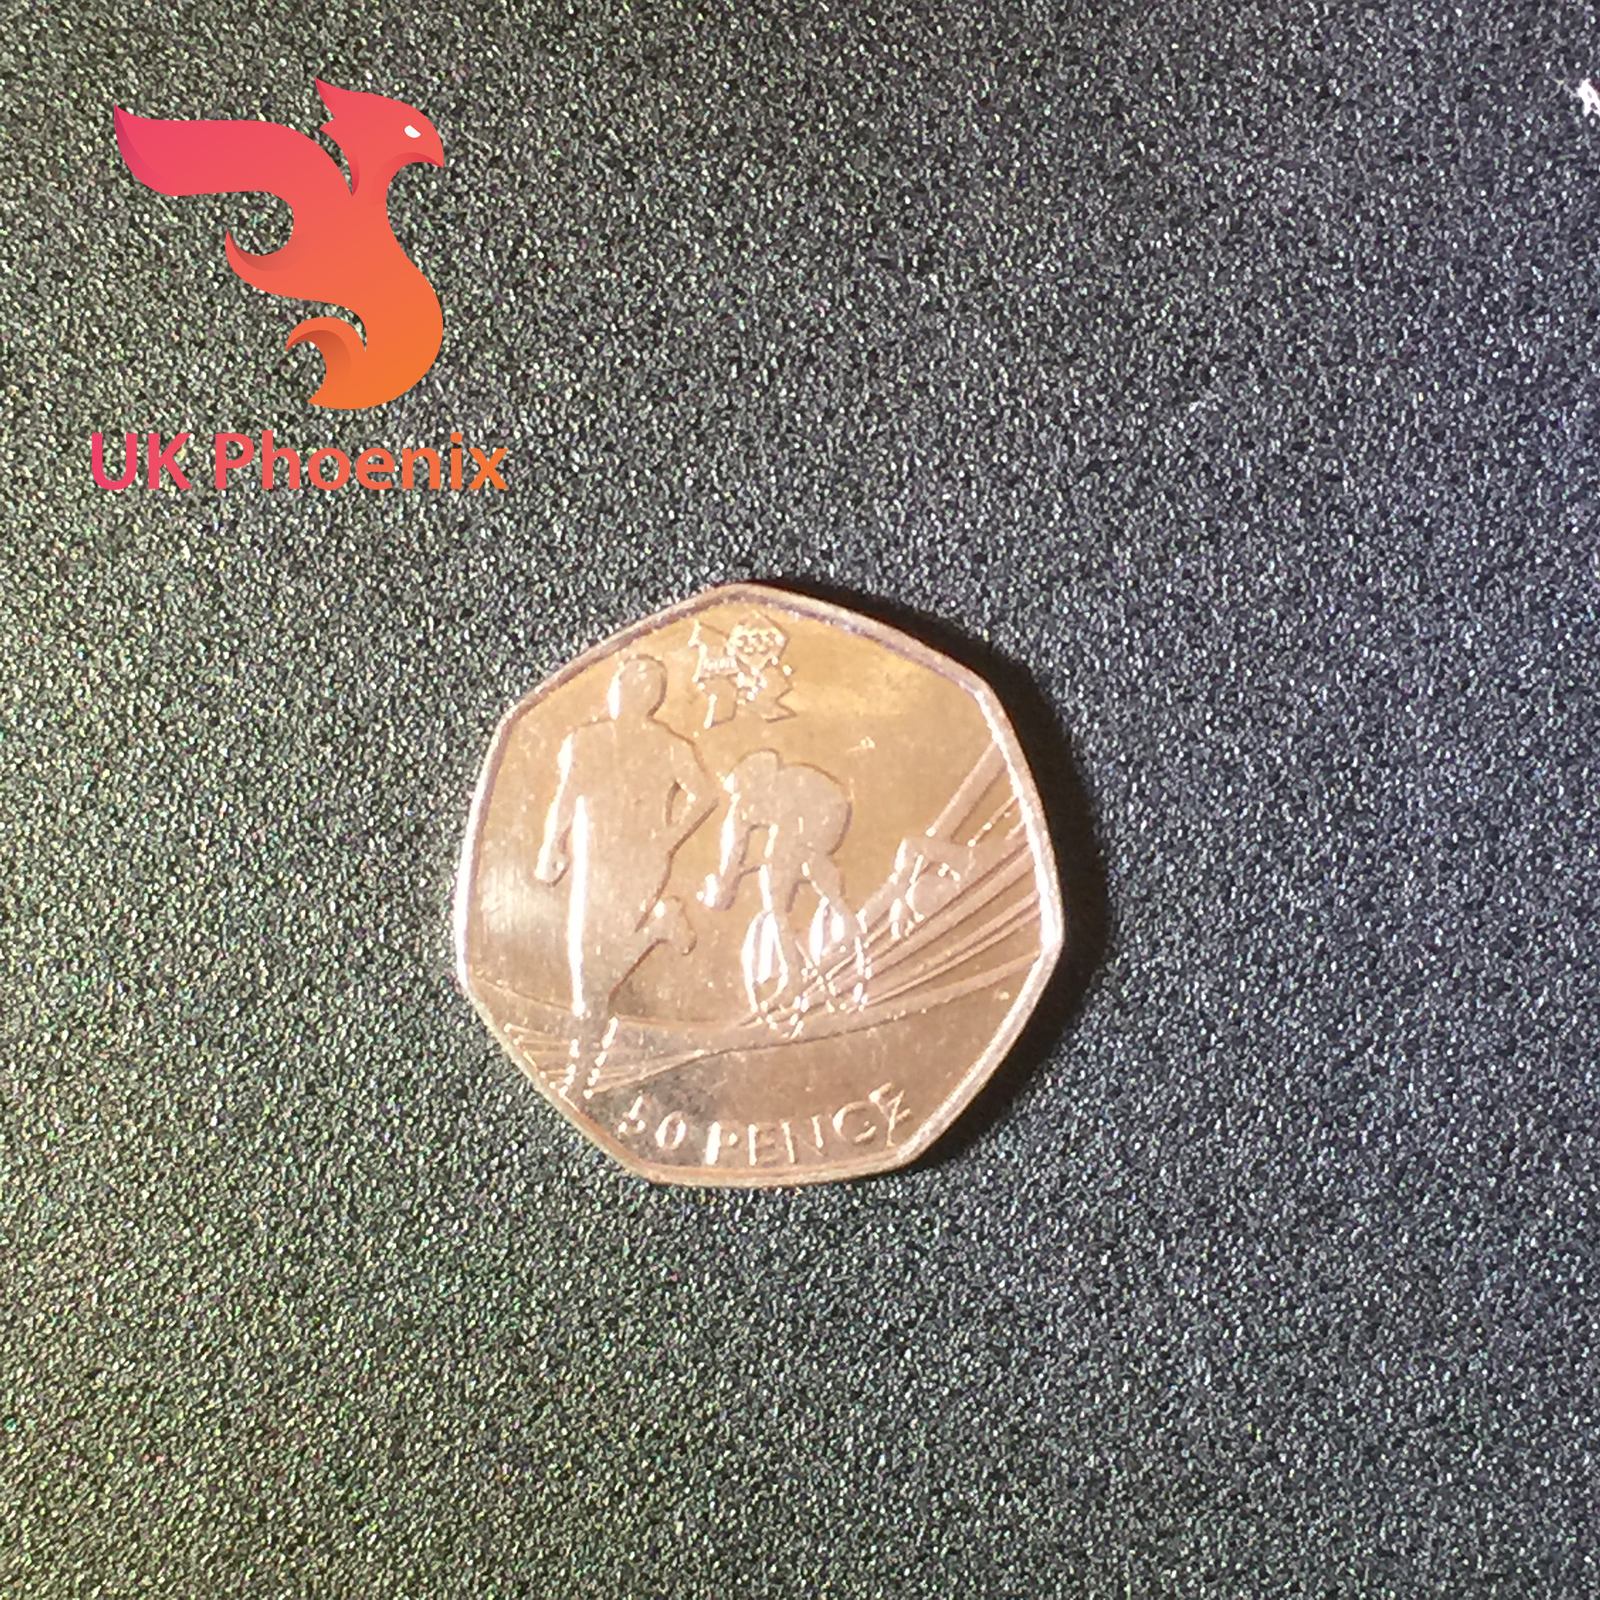 London Olympic 50p coins Fifty pence 2009 Kew Gardens Triathlon Judo Football 6